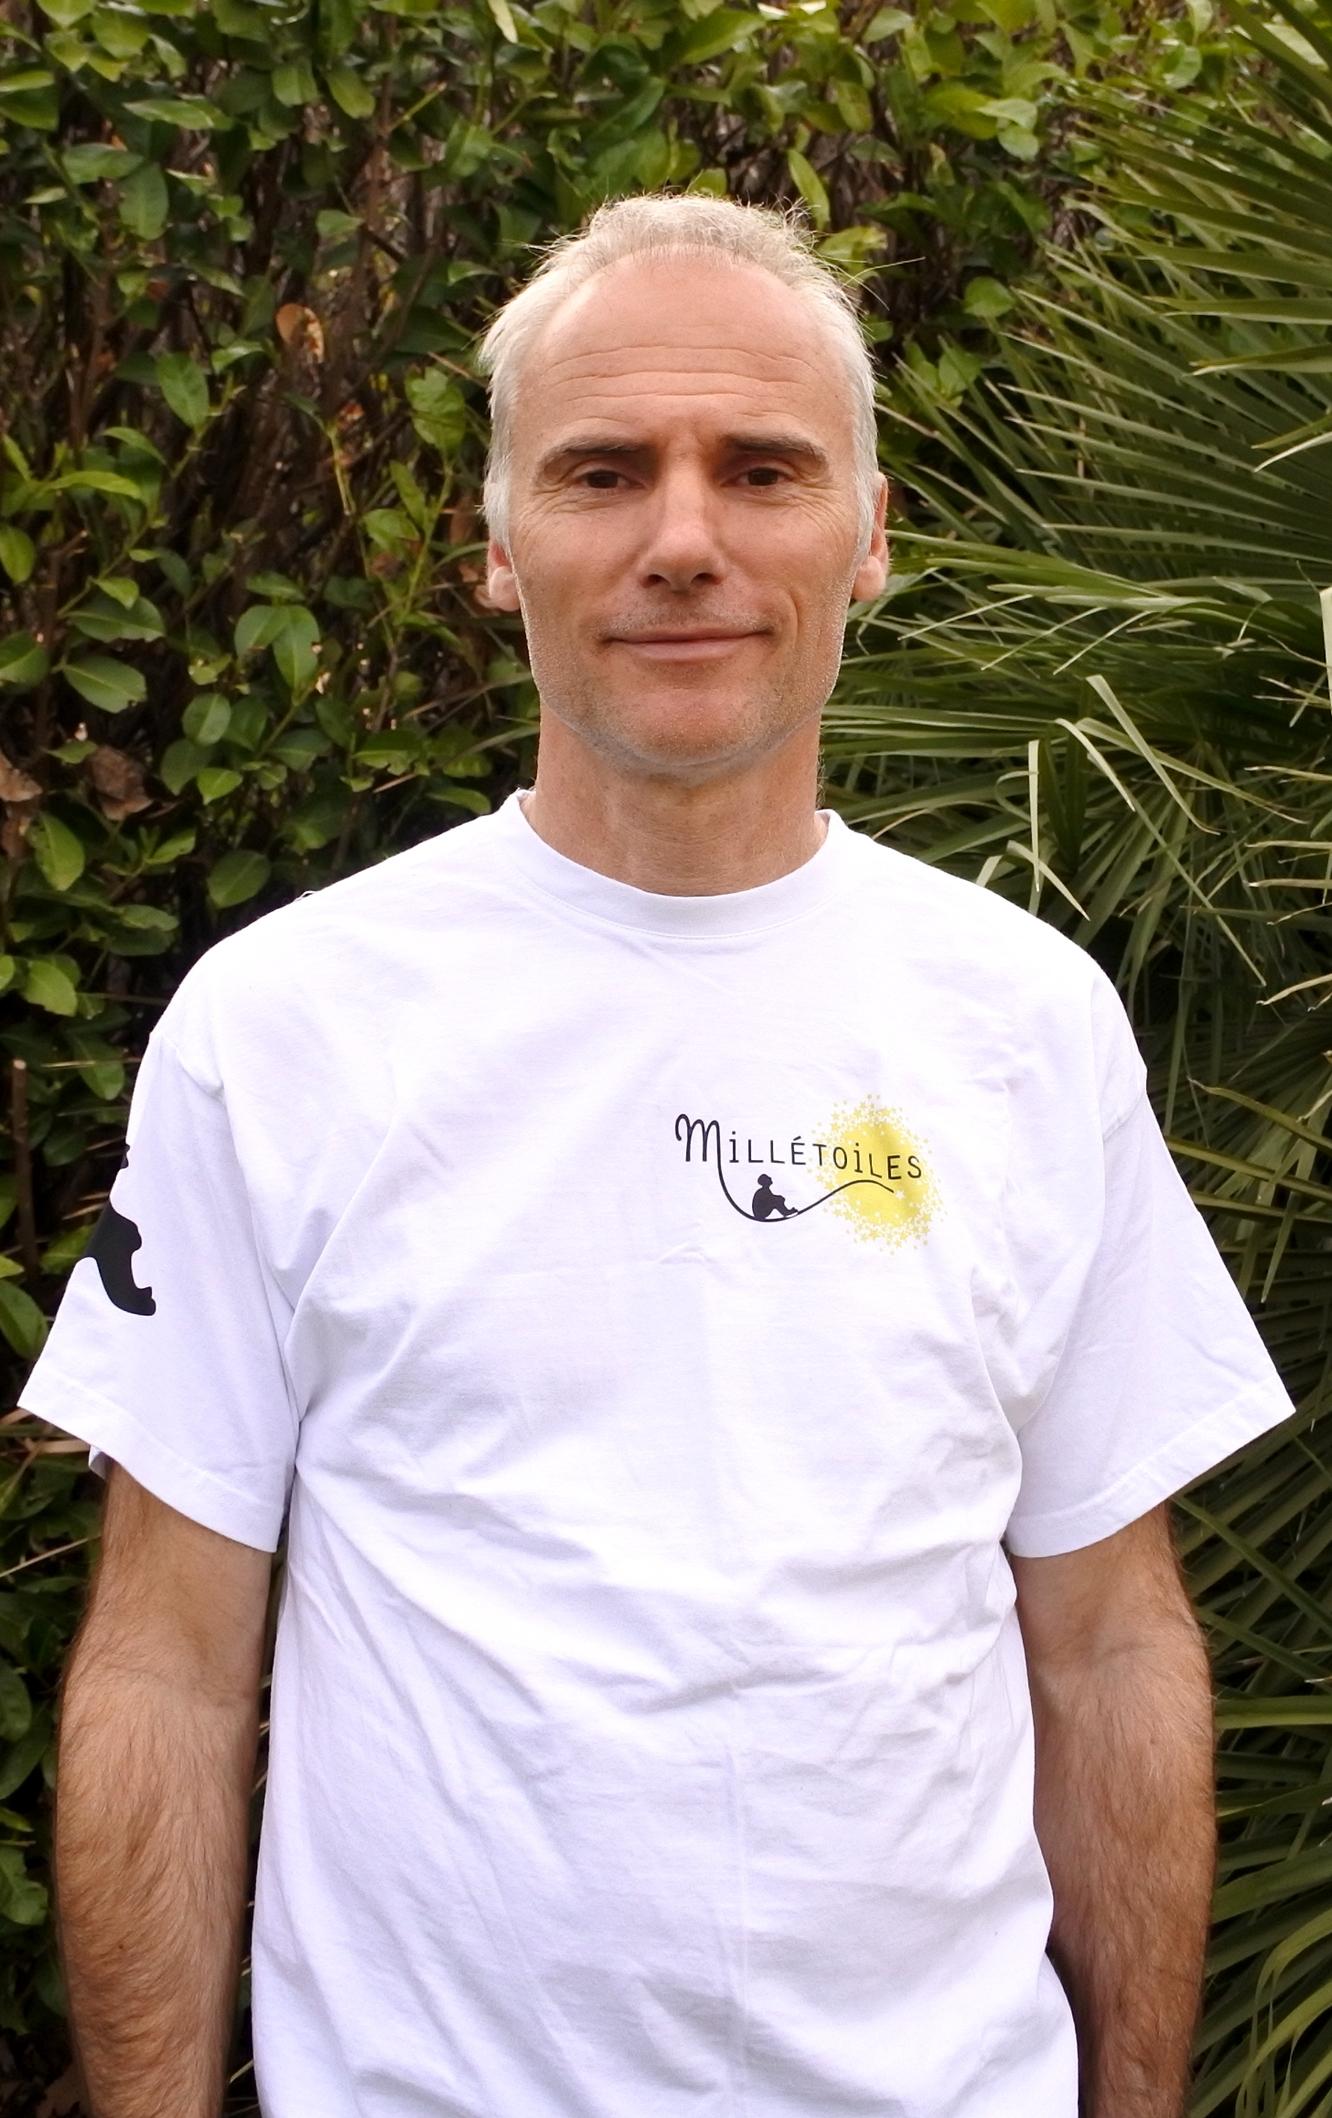 Jean-David Gallet